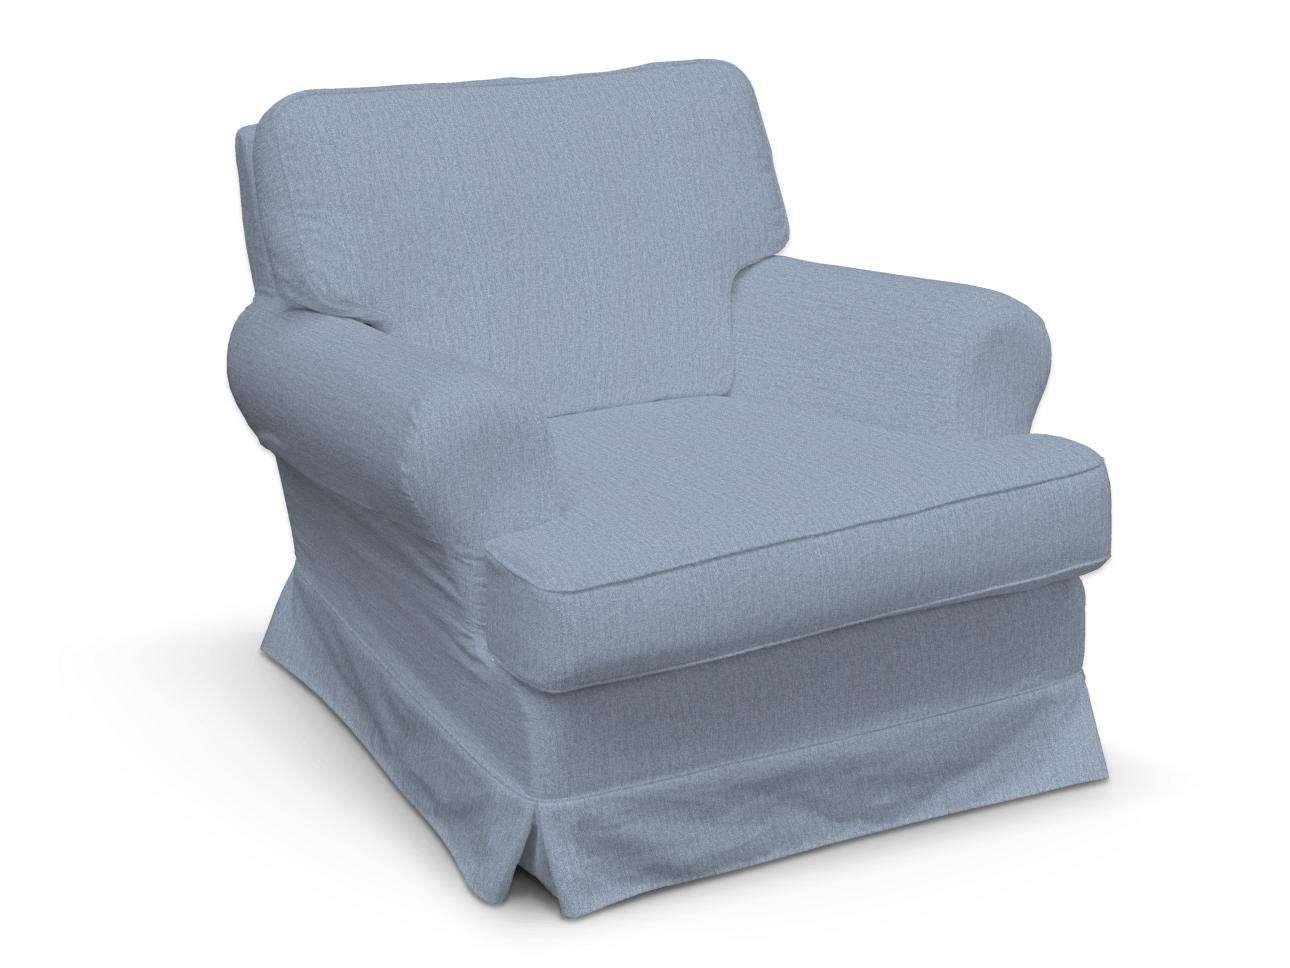 Barkaby Sesselbezug Sessel  Barkaby von der Kollektion Chenille , Stoff: 702-13